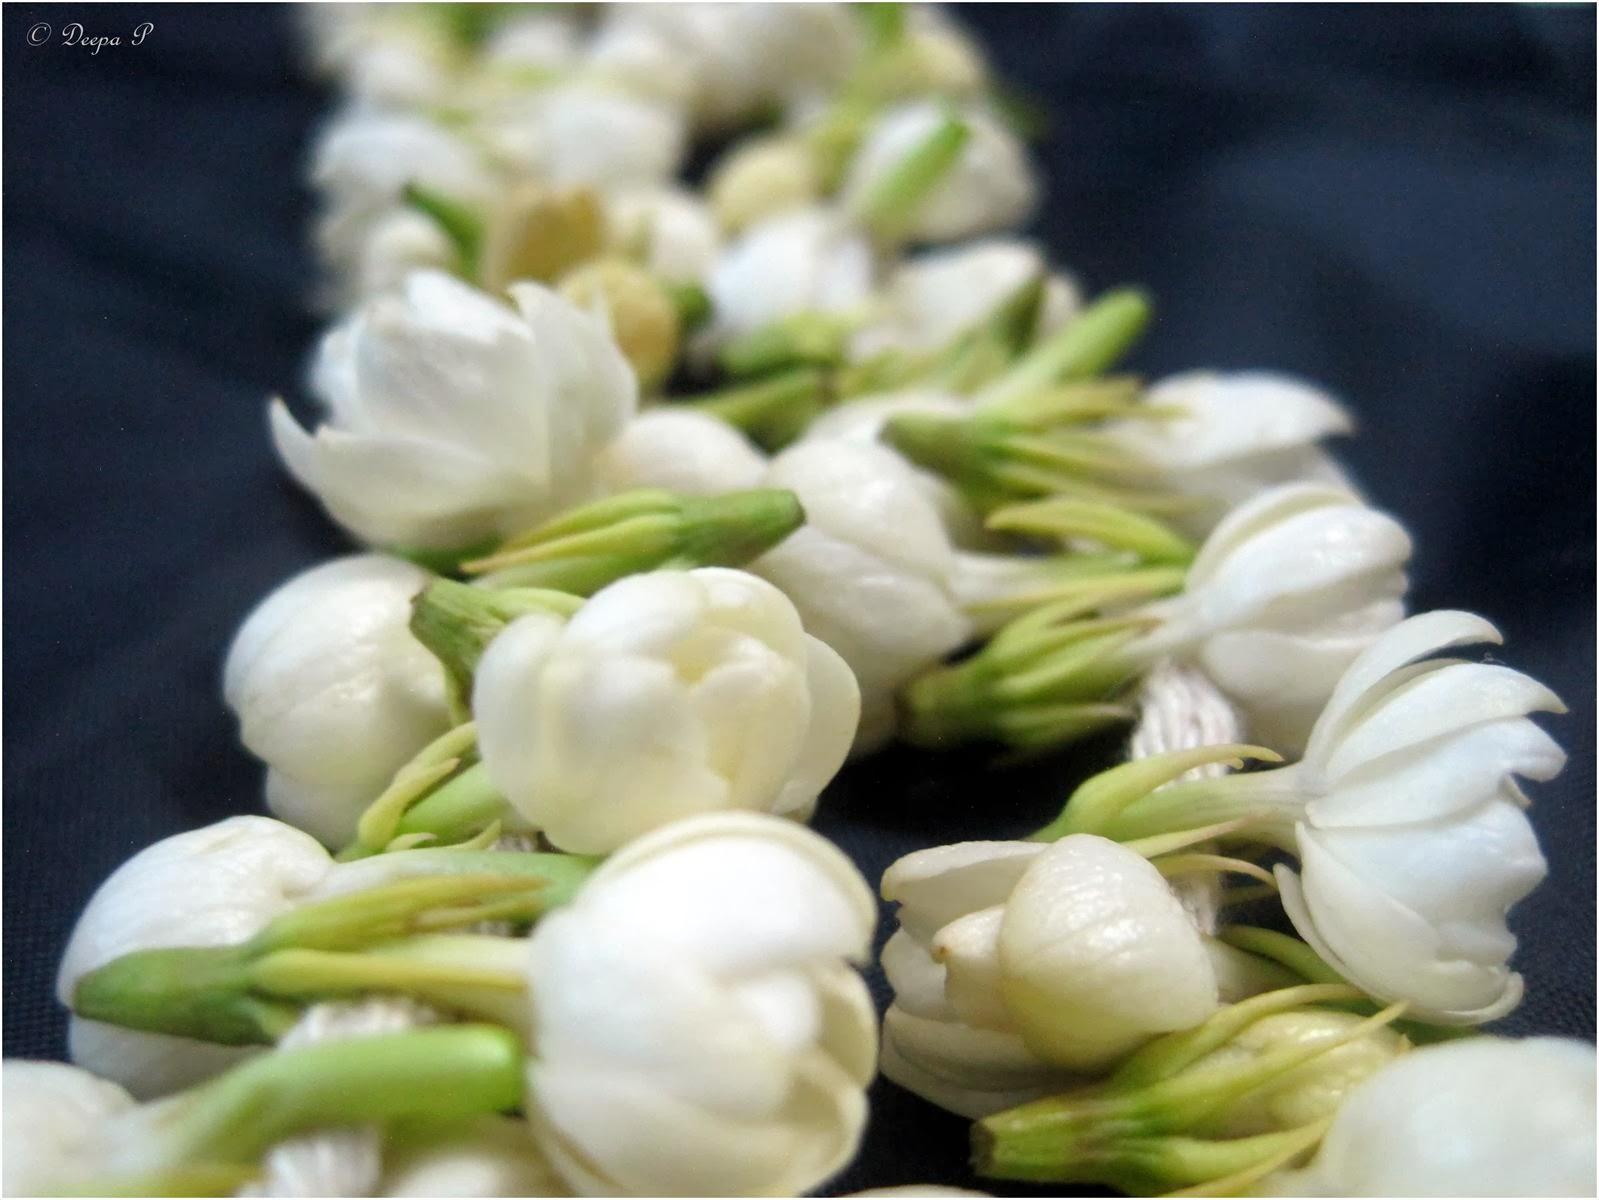 A to z challenge j jasminum sambac flower indian jasmine flower a to z challenge j jasminum sambac flower indian jasmine flower izmirmasajfo